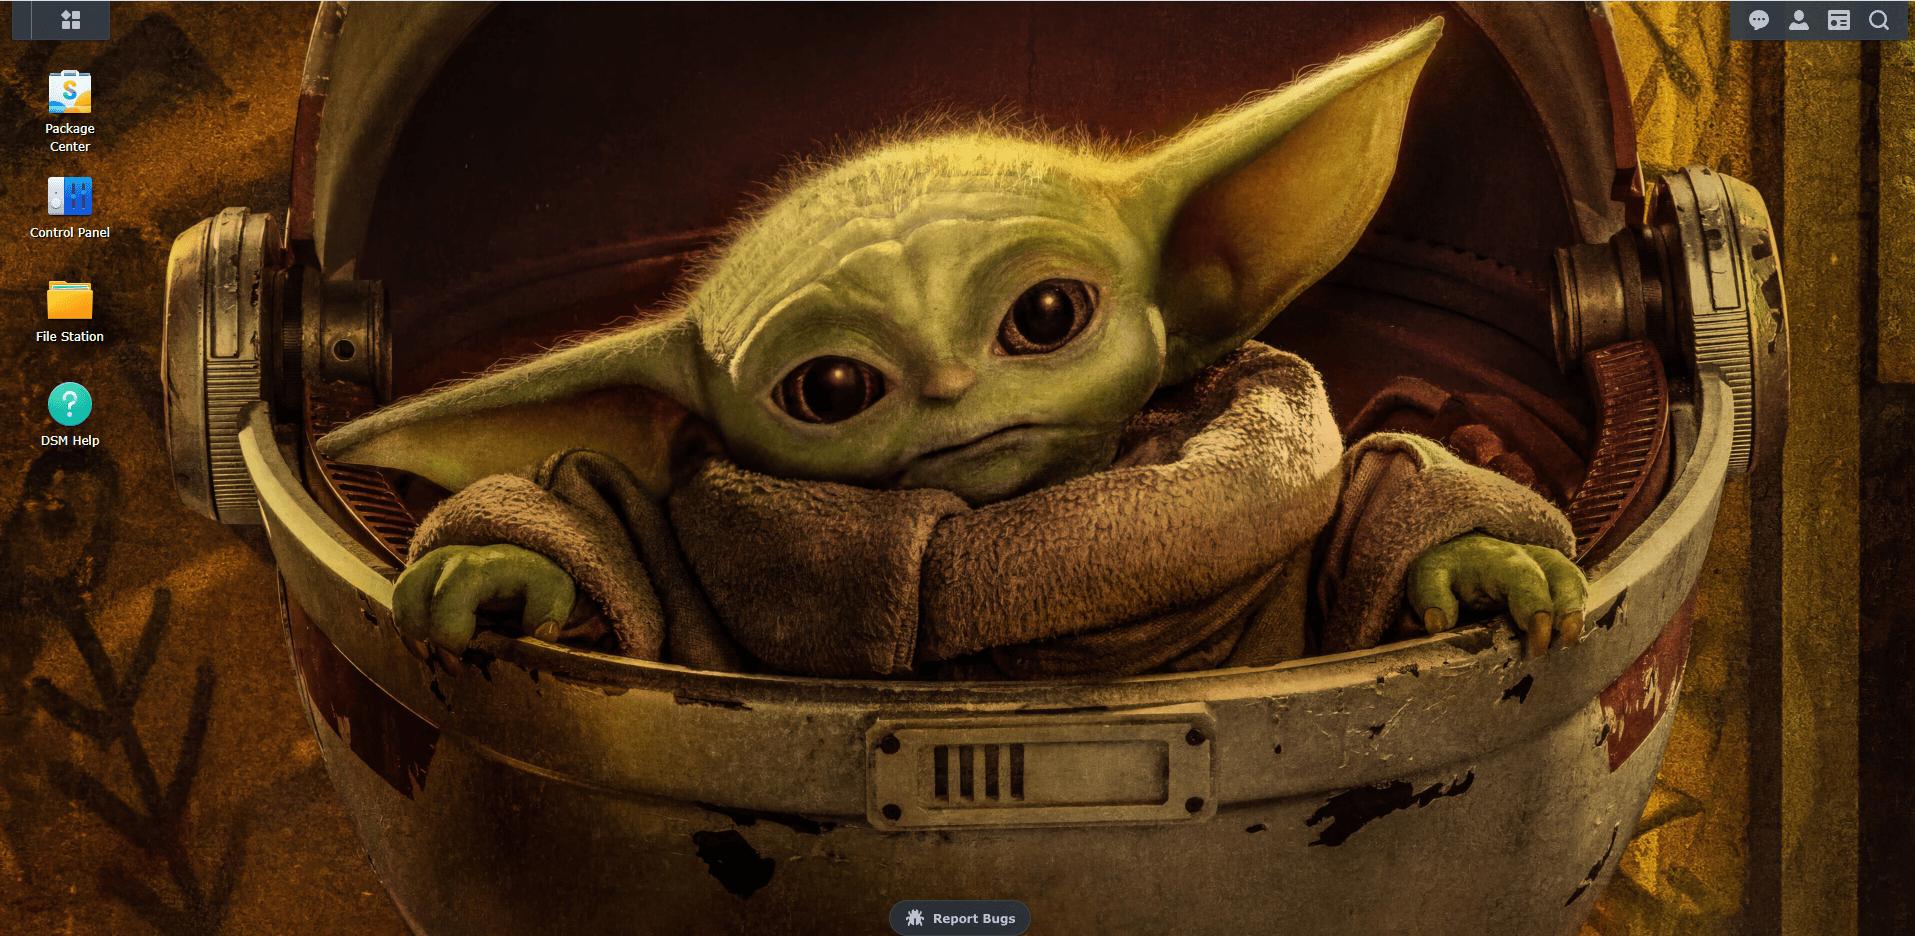 Yoda wallpaper Synology DSM 7